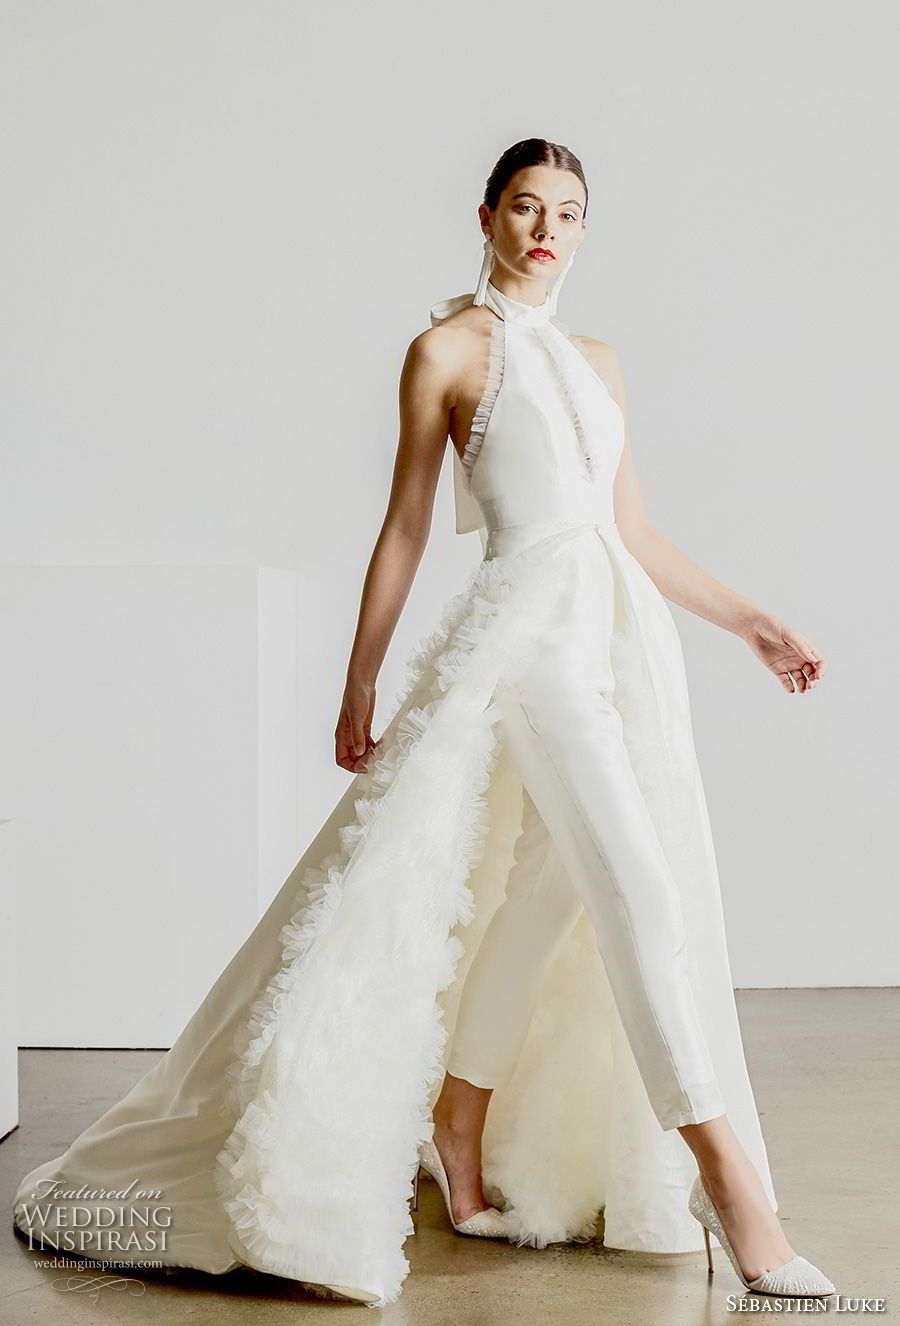 33b5bfdc017 sebastien luke spring 2019 bridal halter high neck simple minimalist modern  ankle jumpsuit wedding dress a